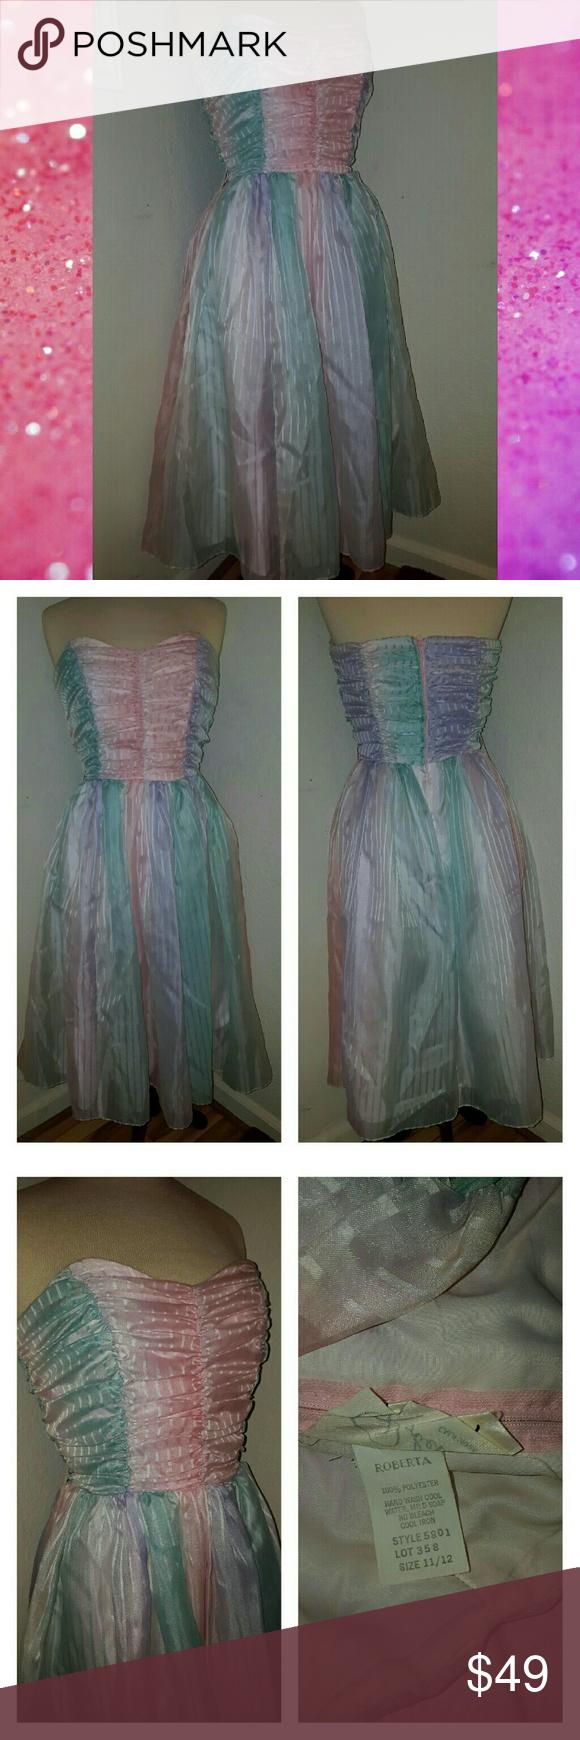 Sold vintage s s prom dress pink s prom dresses